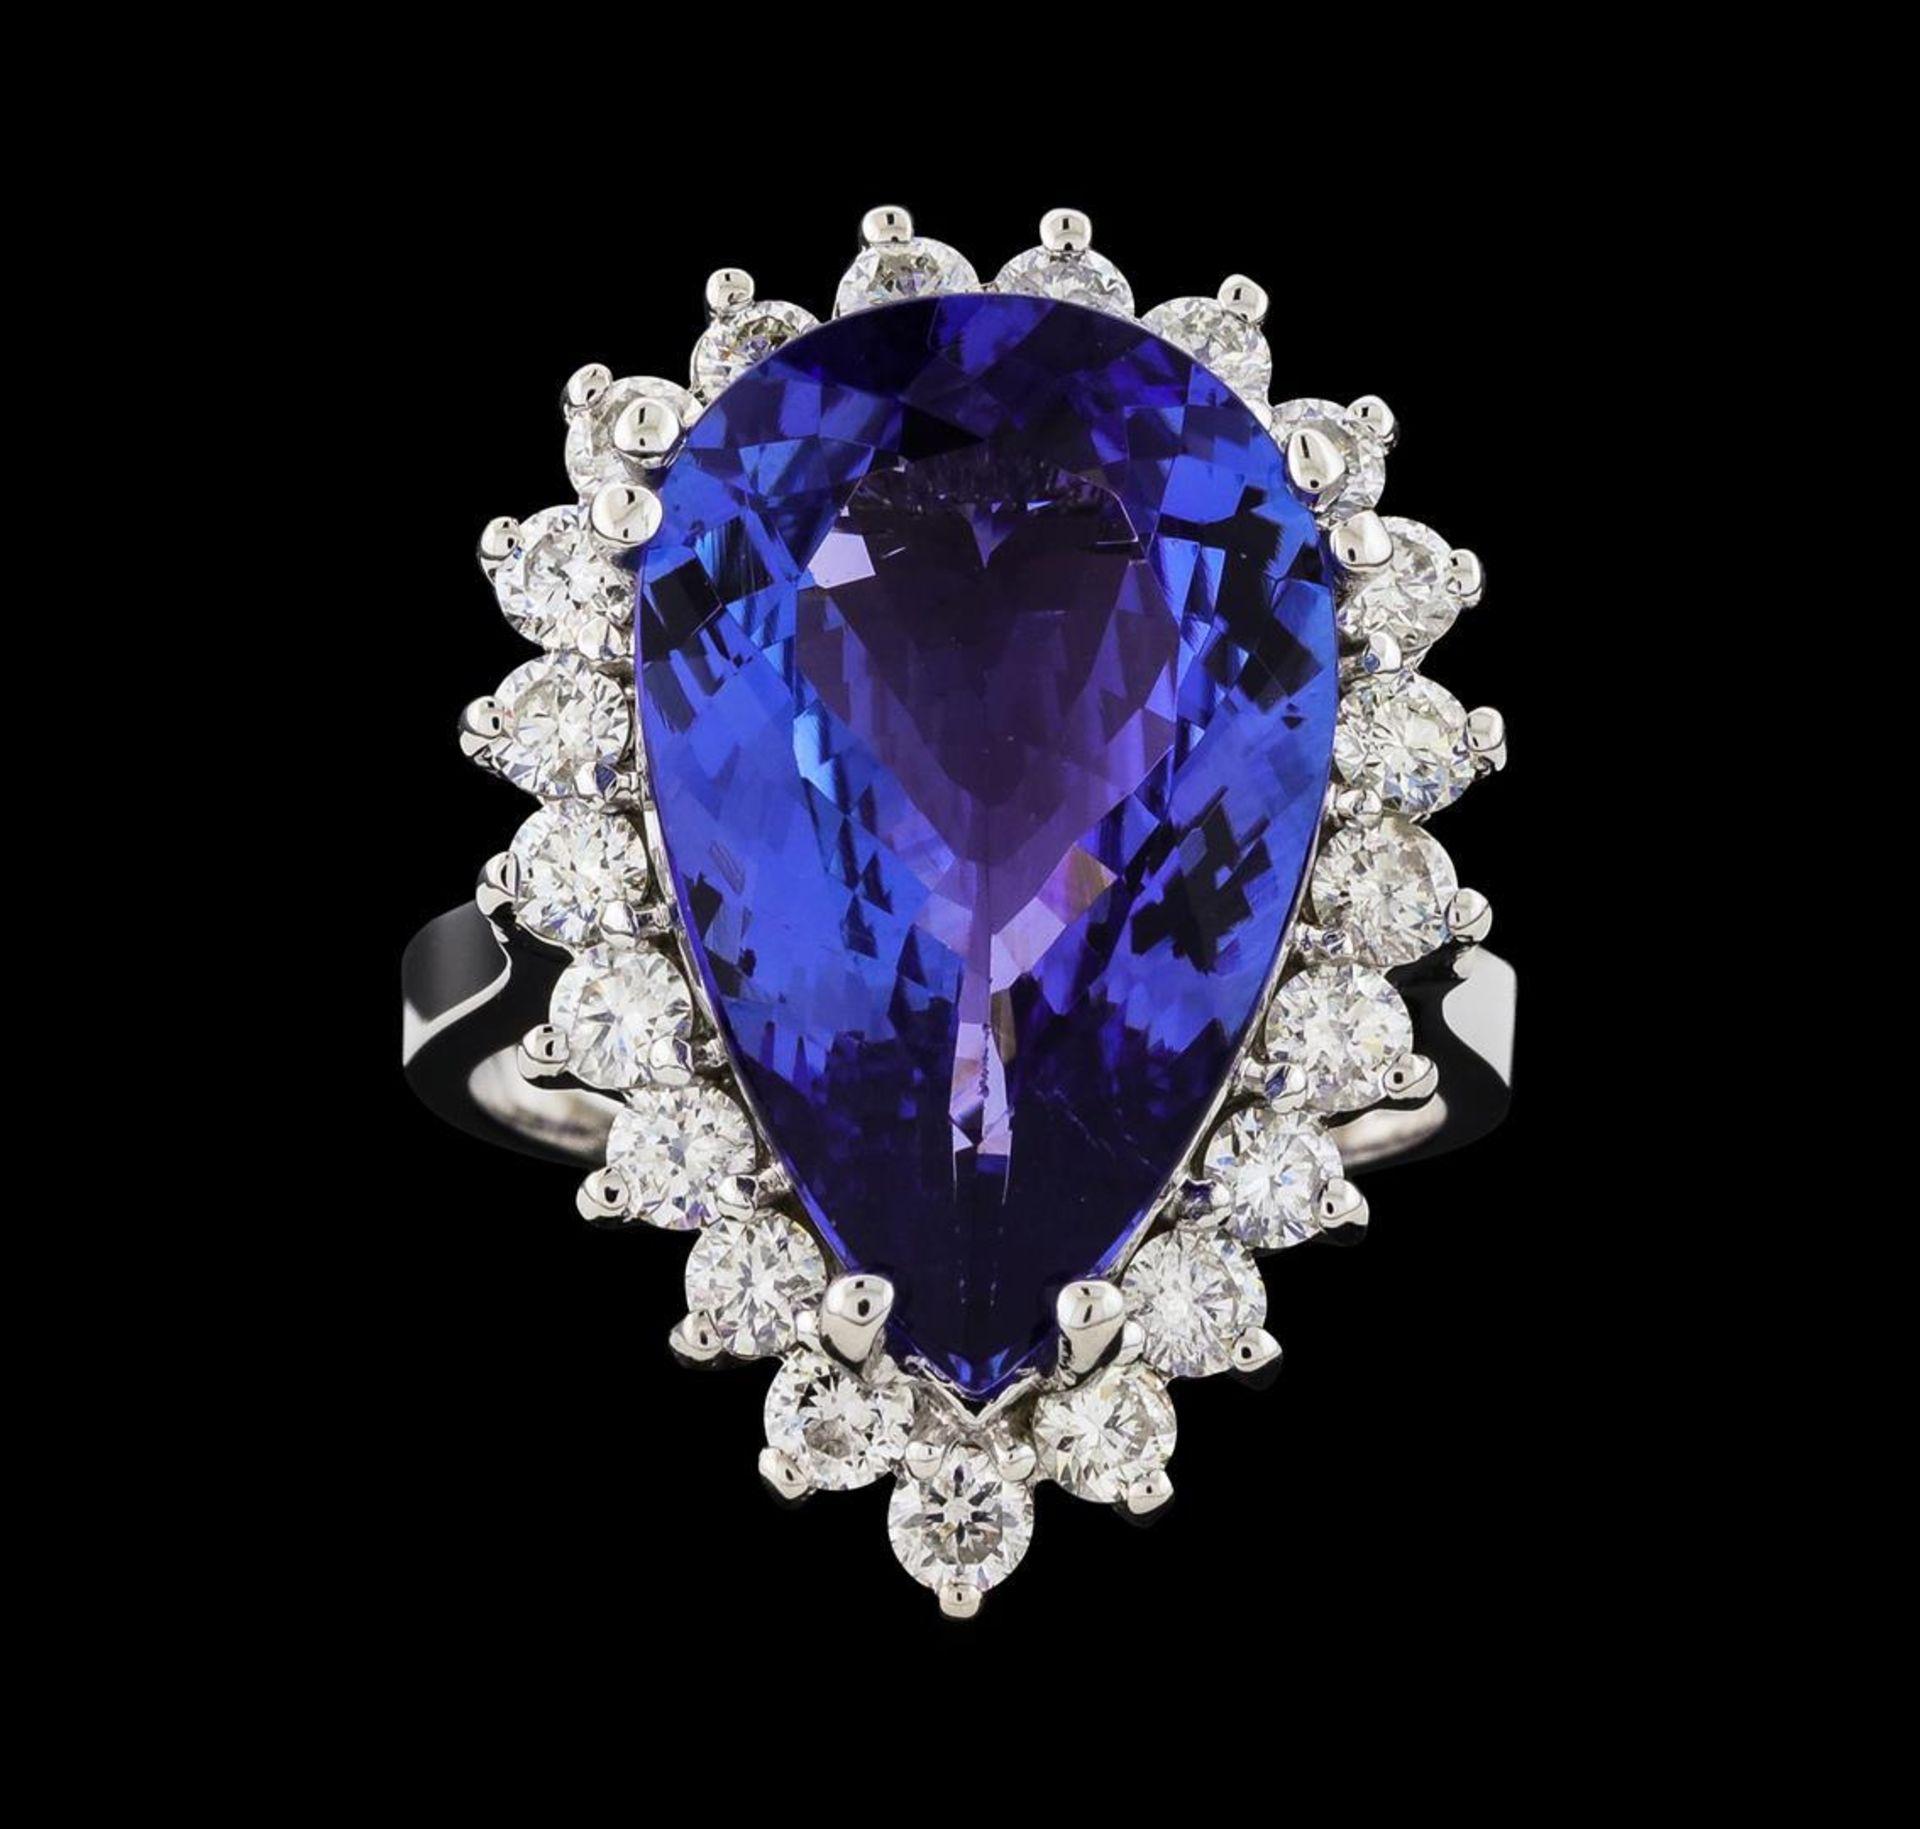 GIA Cert 8.74 ctw Tanzanite and Diamond Ring - 14KT White Gold - Image 2 of 6